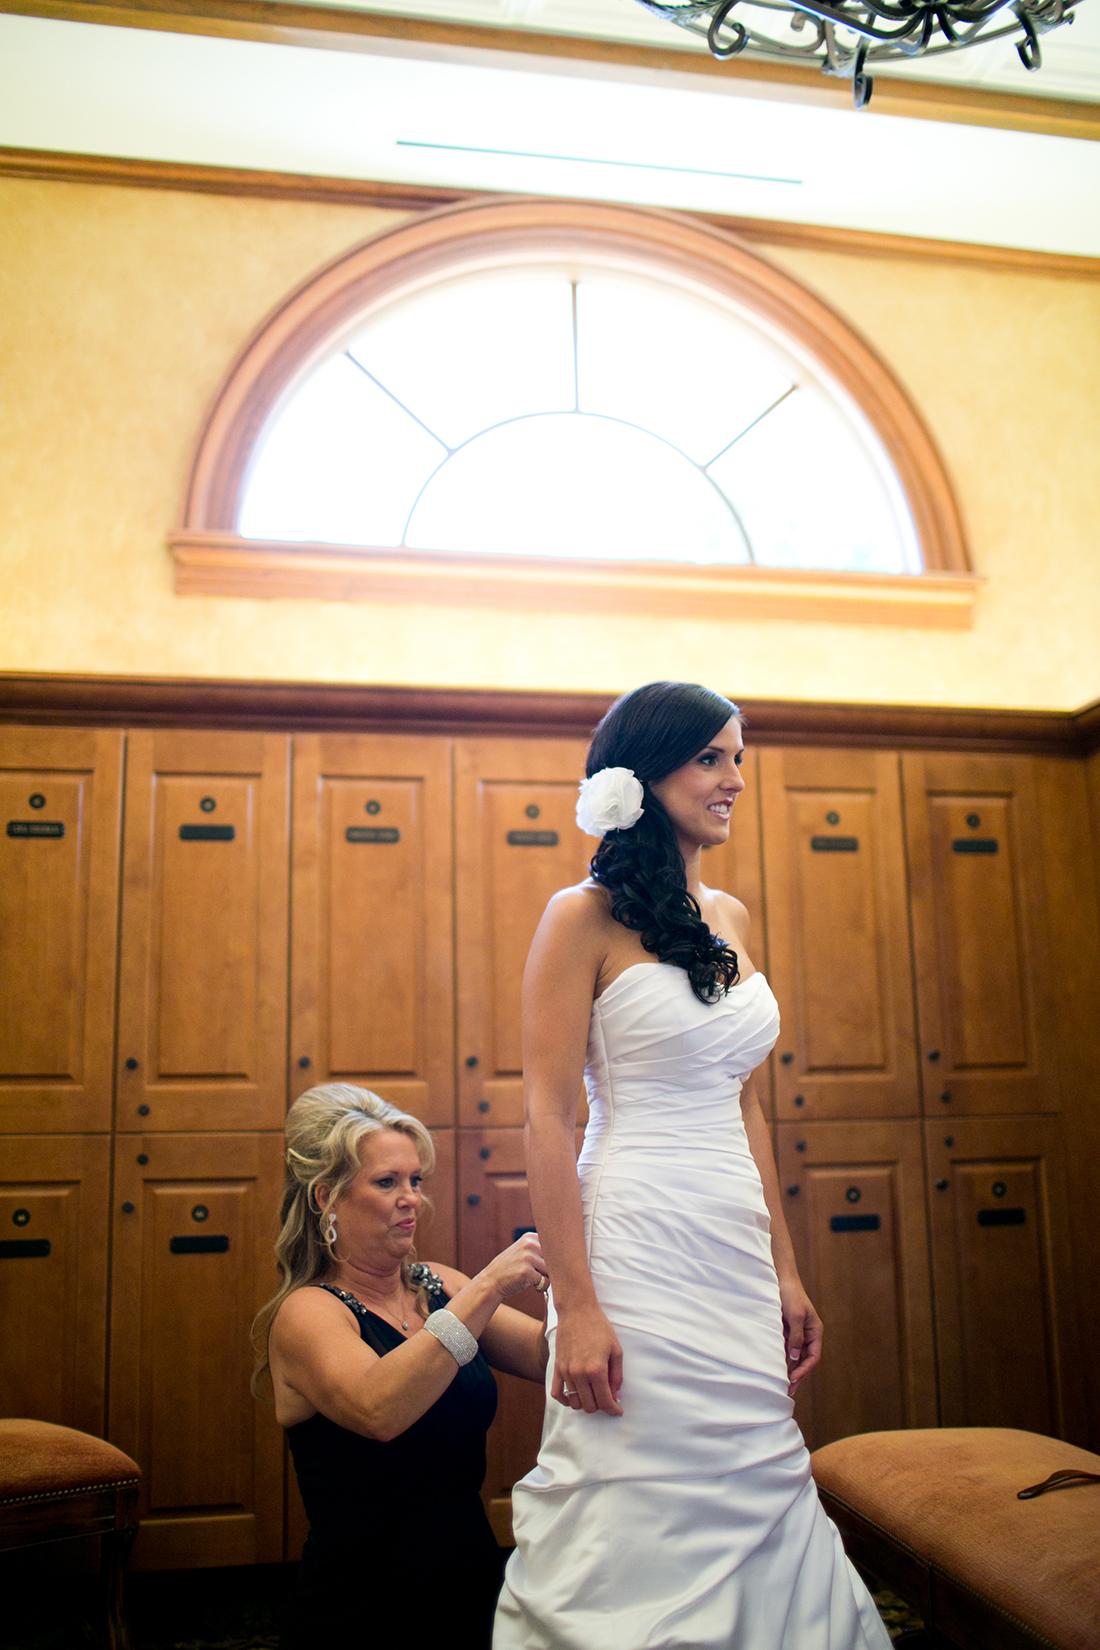 adam-szarmack-tpc-sawgrass-ponte-vedra-wedding-photographer-PZ3A9460.jpg